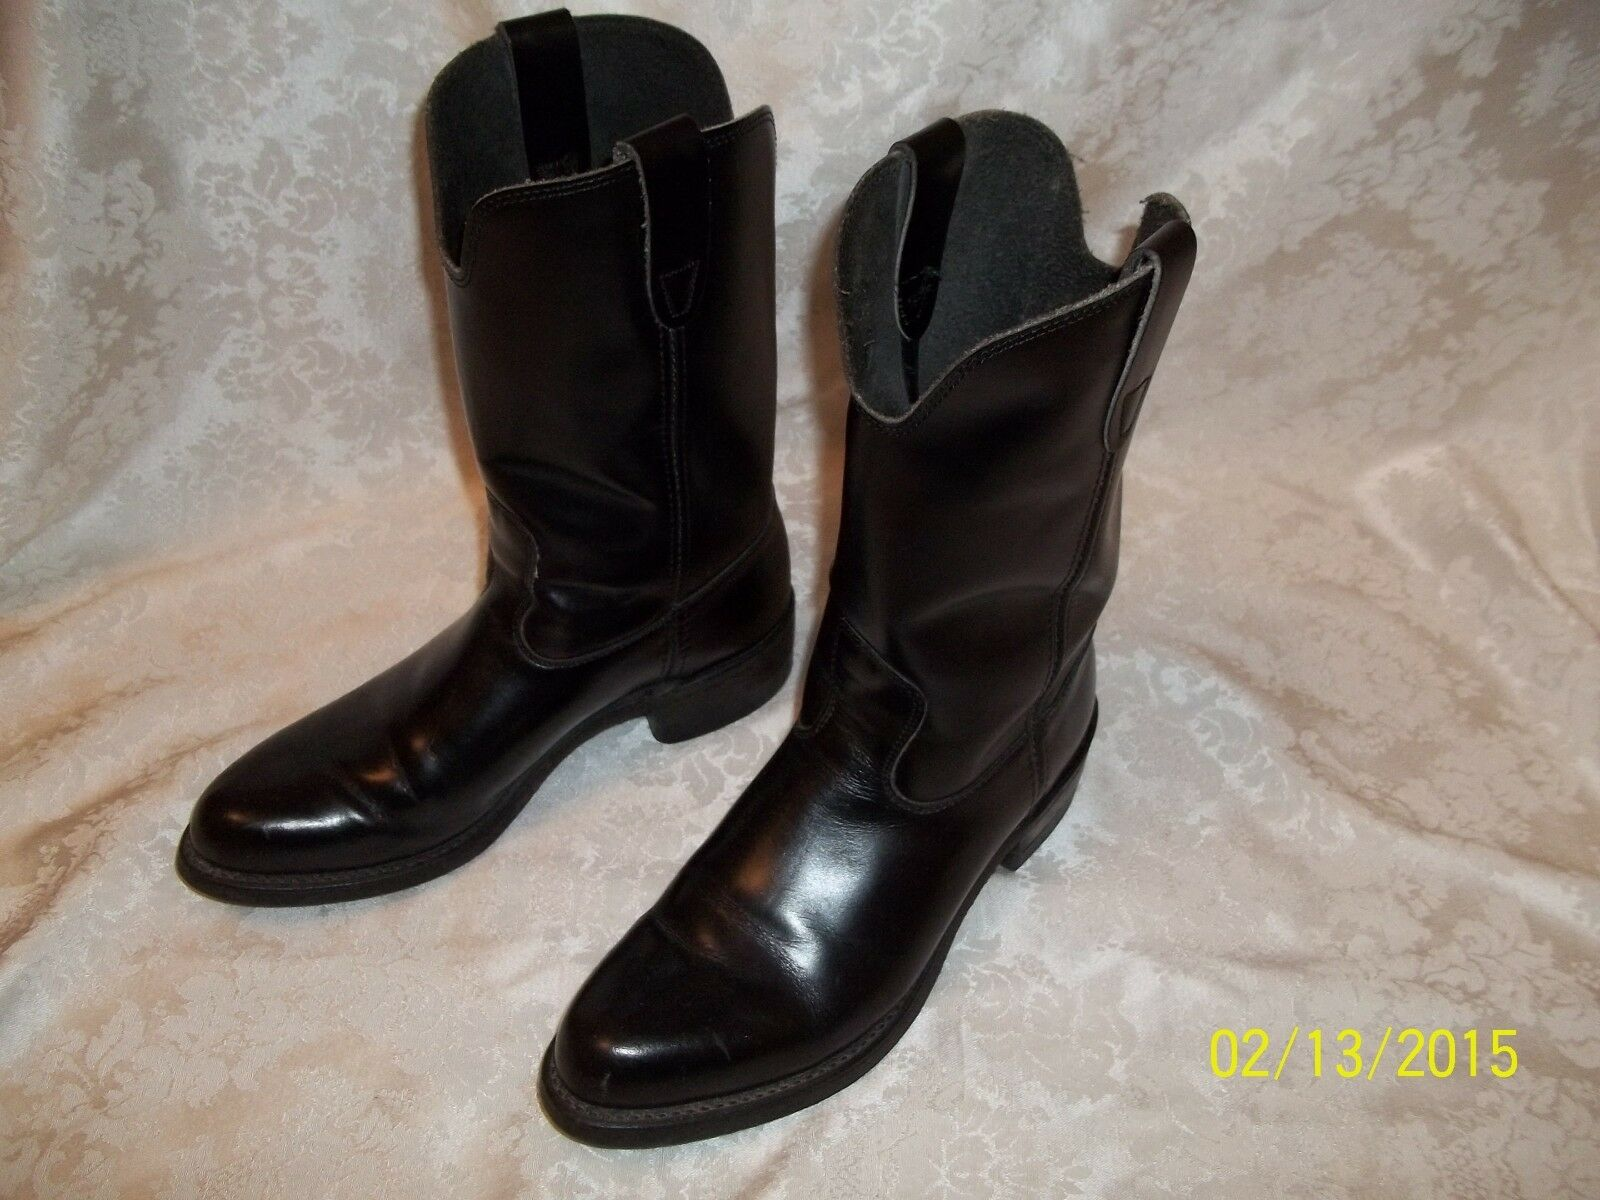 Vintage biltrite botas Para Hombre d trabajo montar motocicleta Usa bonito MUST SEE